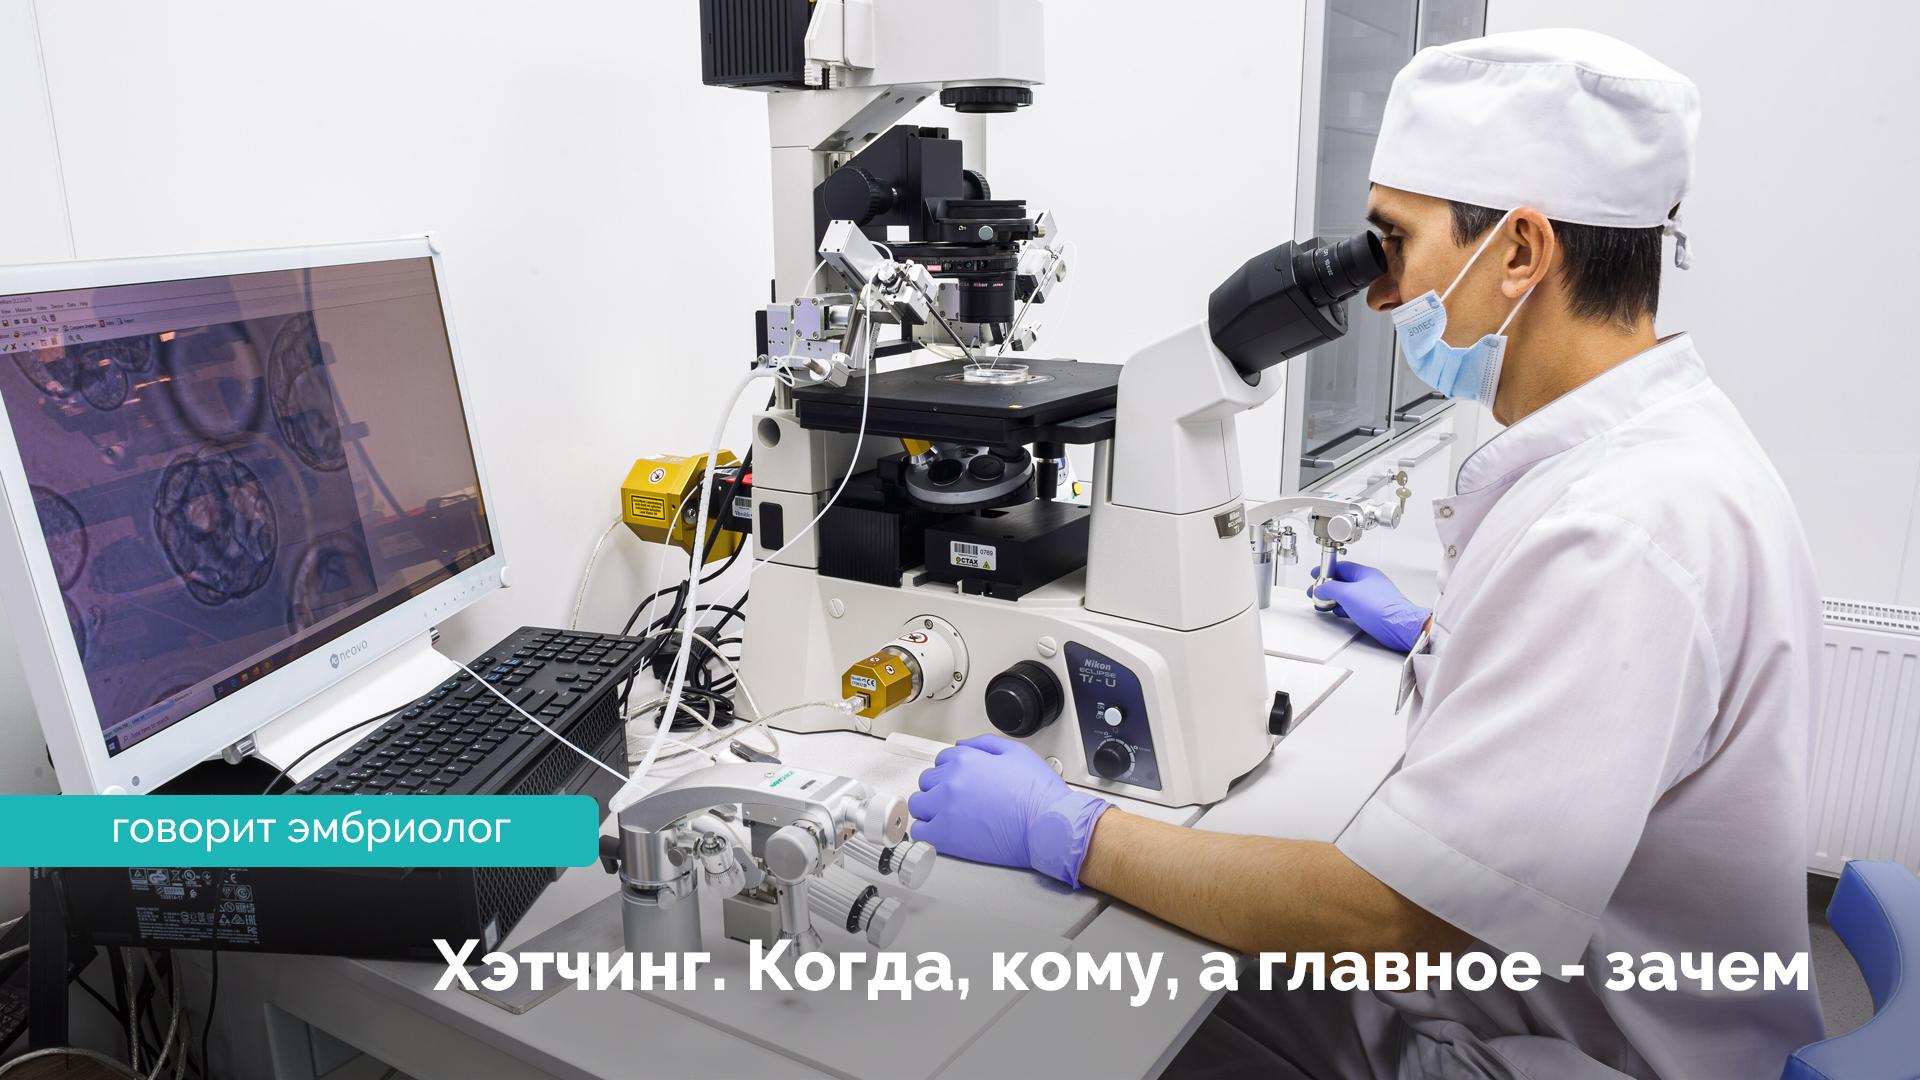 Хэтчинг. Василий Васильевич Лялюк